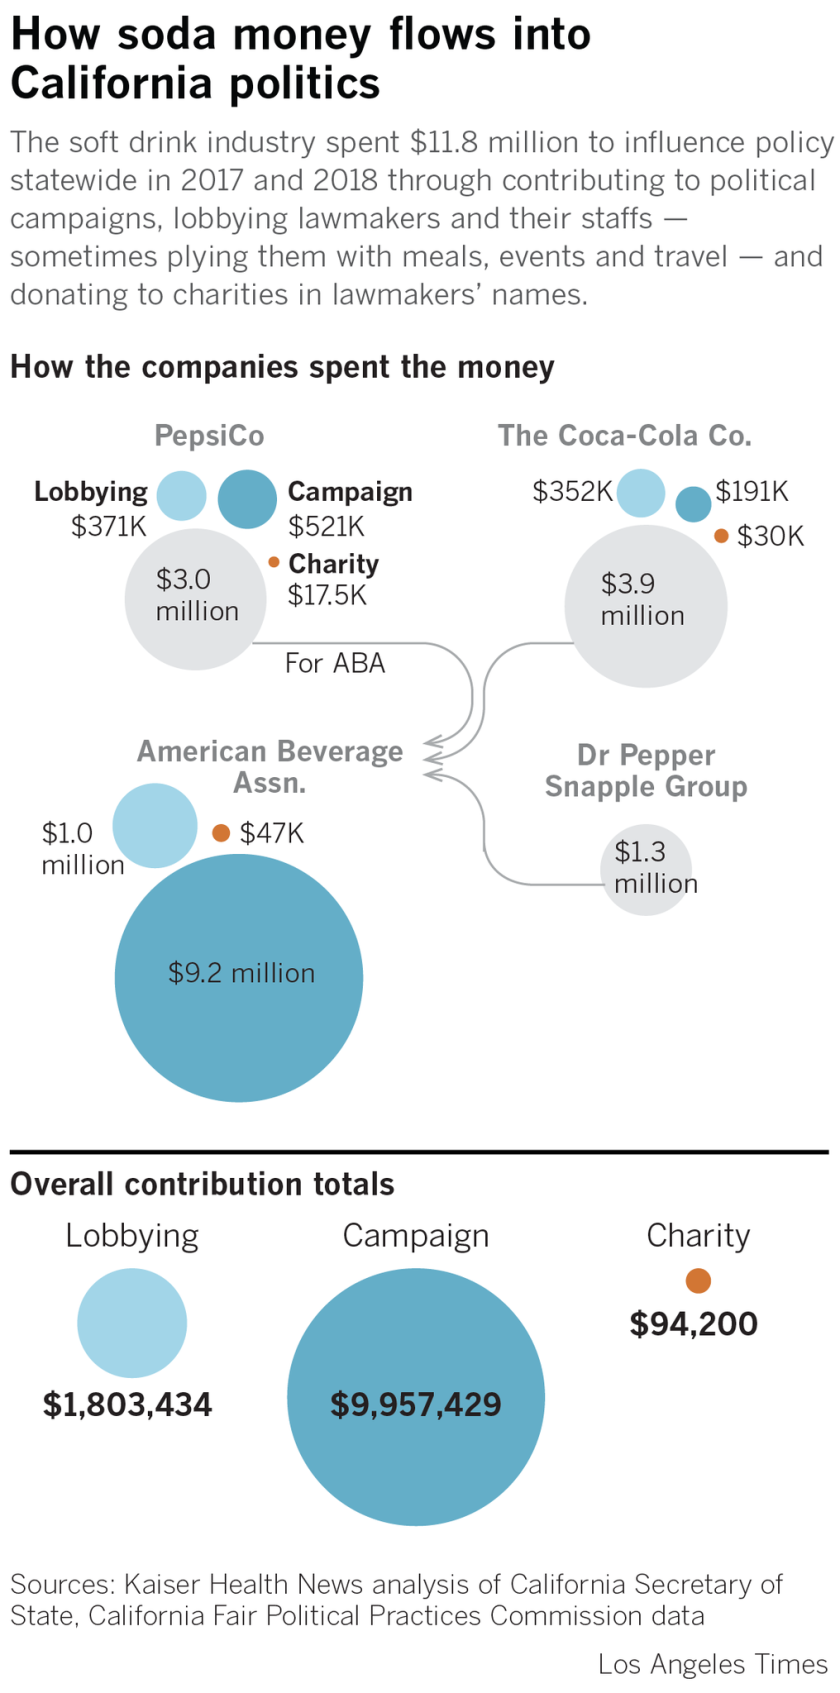 Soda money in California politics